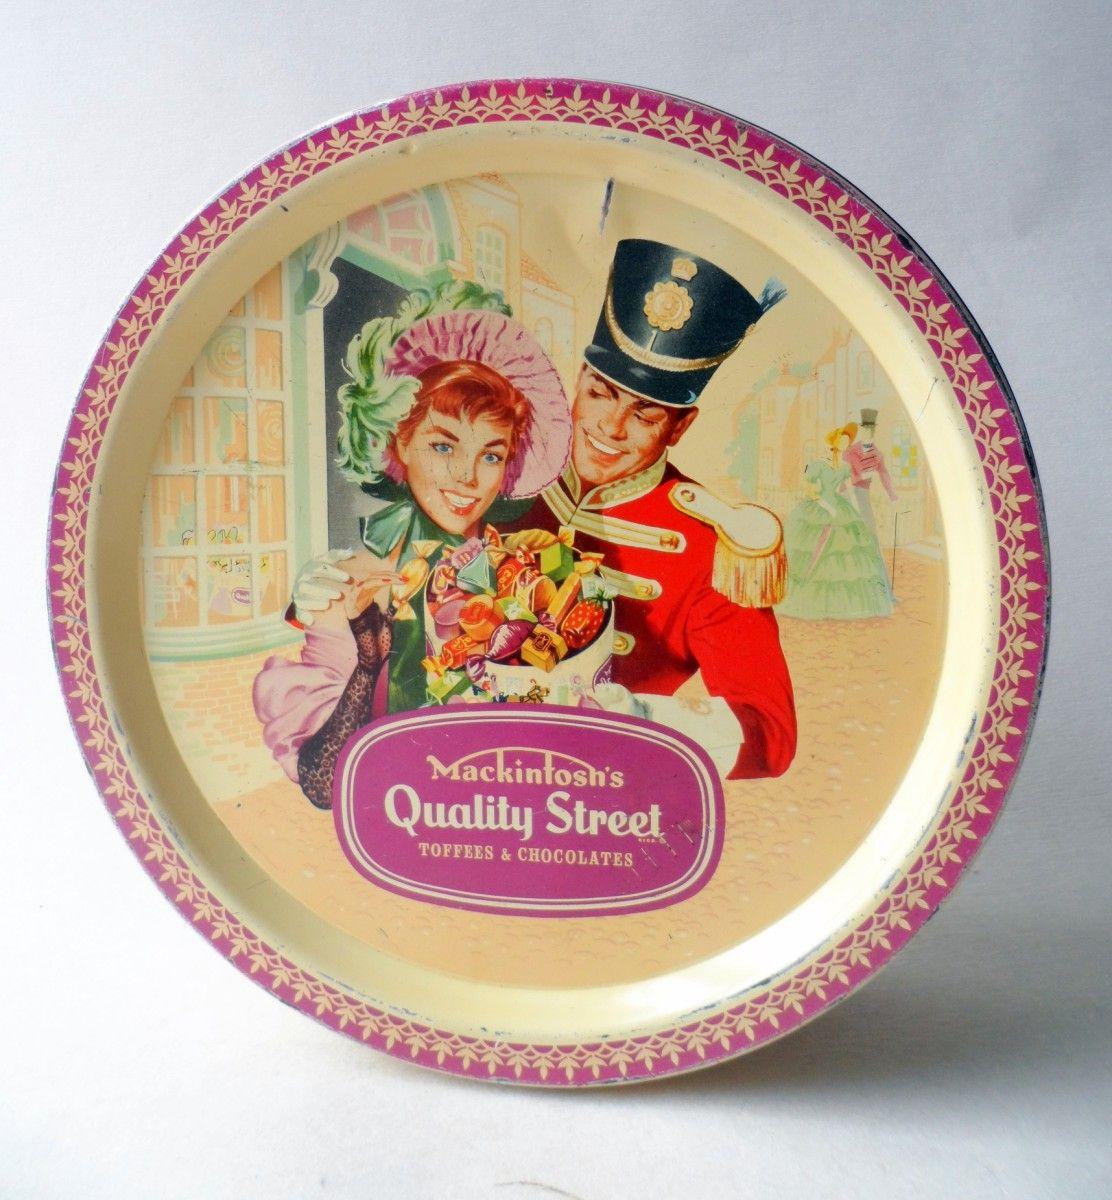 htf-vintage-toffee-chocolates-tin-mackintosh-halifax-3lb-quality-street-crinoline-lady-soldier-christmas-snowman-1960s-1309-p.jpg (1112×1200)